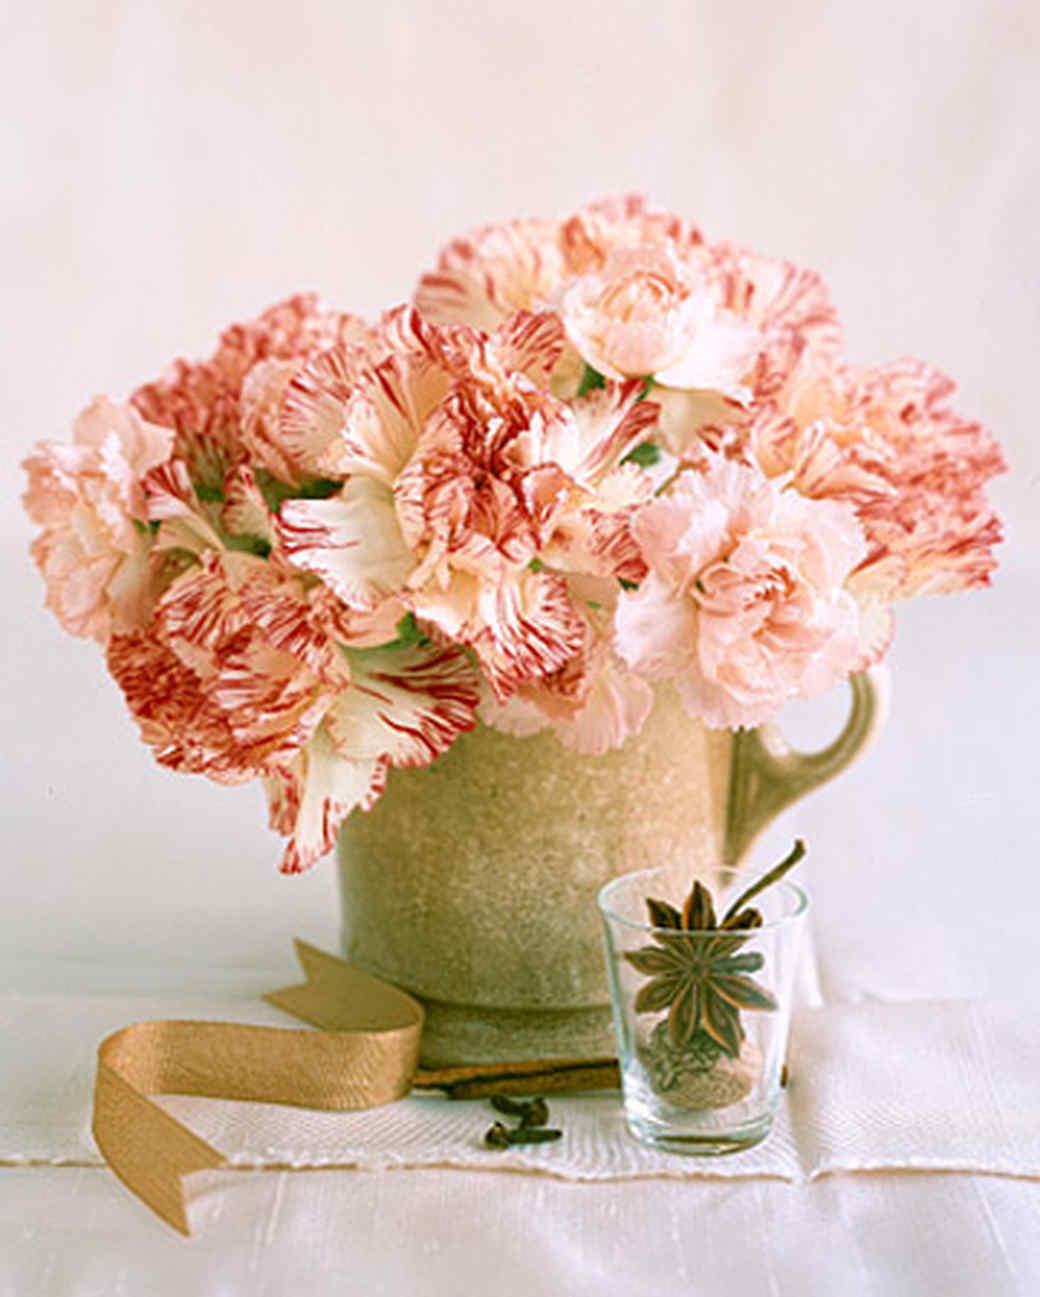 a98600_gar_carnations.jpg